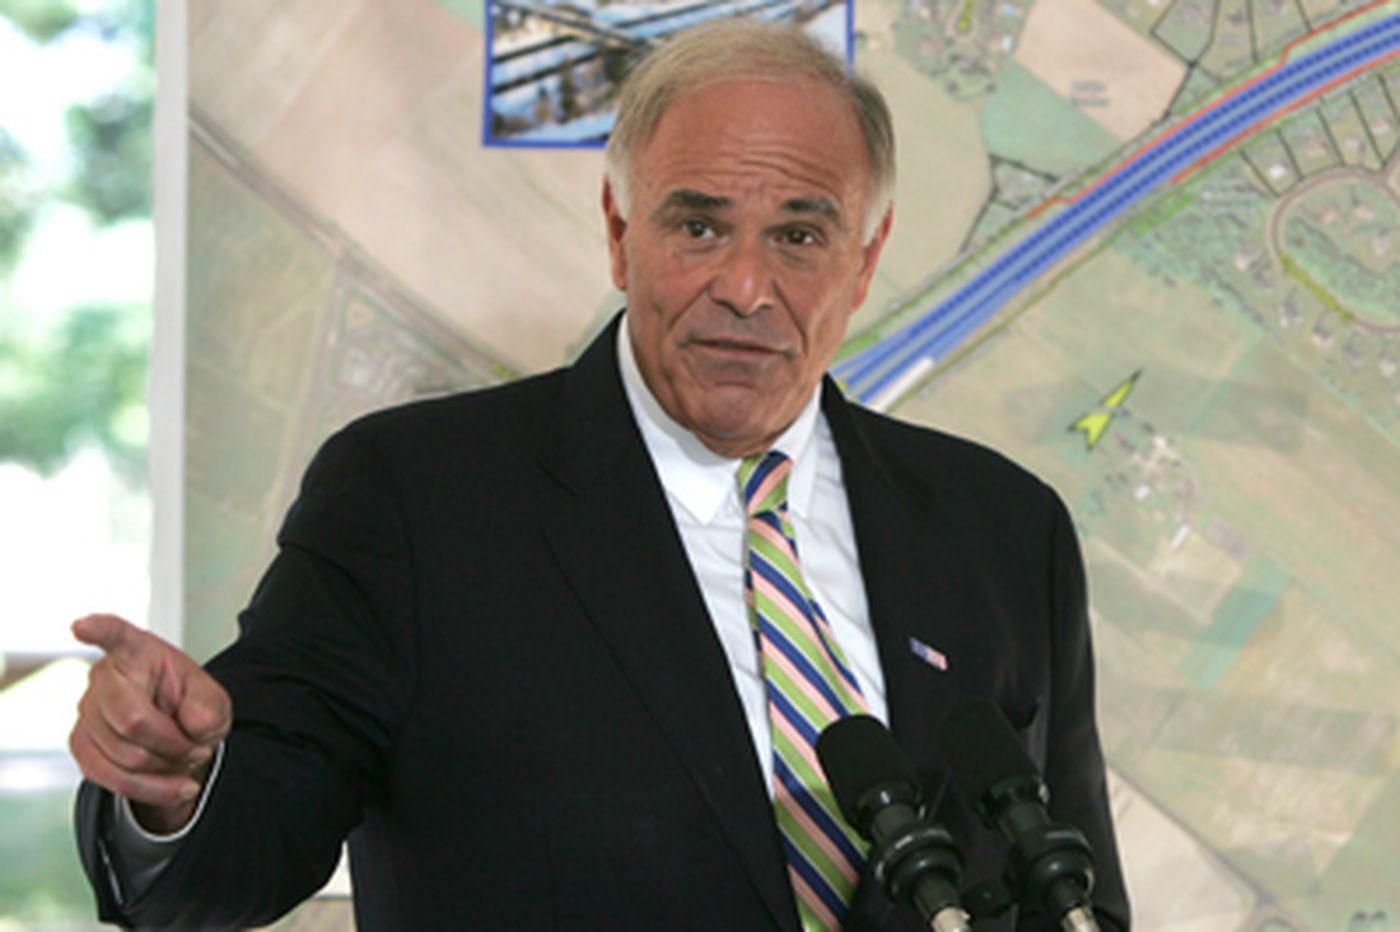 Rendell calls bid to curb guns in Pennsylvania 'a lost cause'